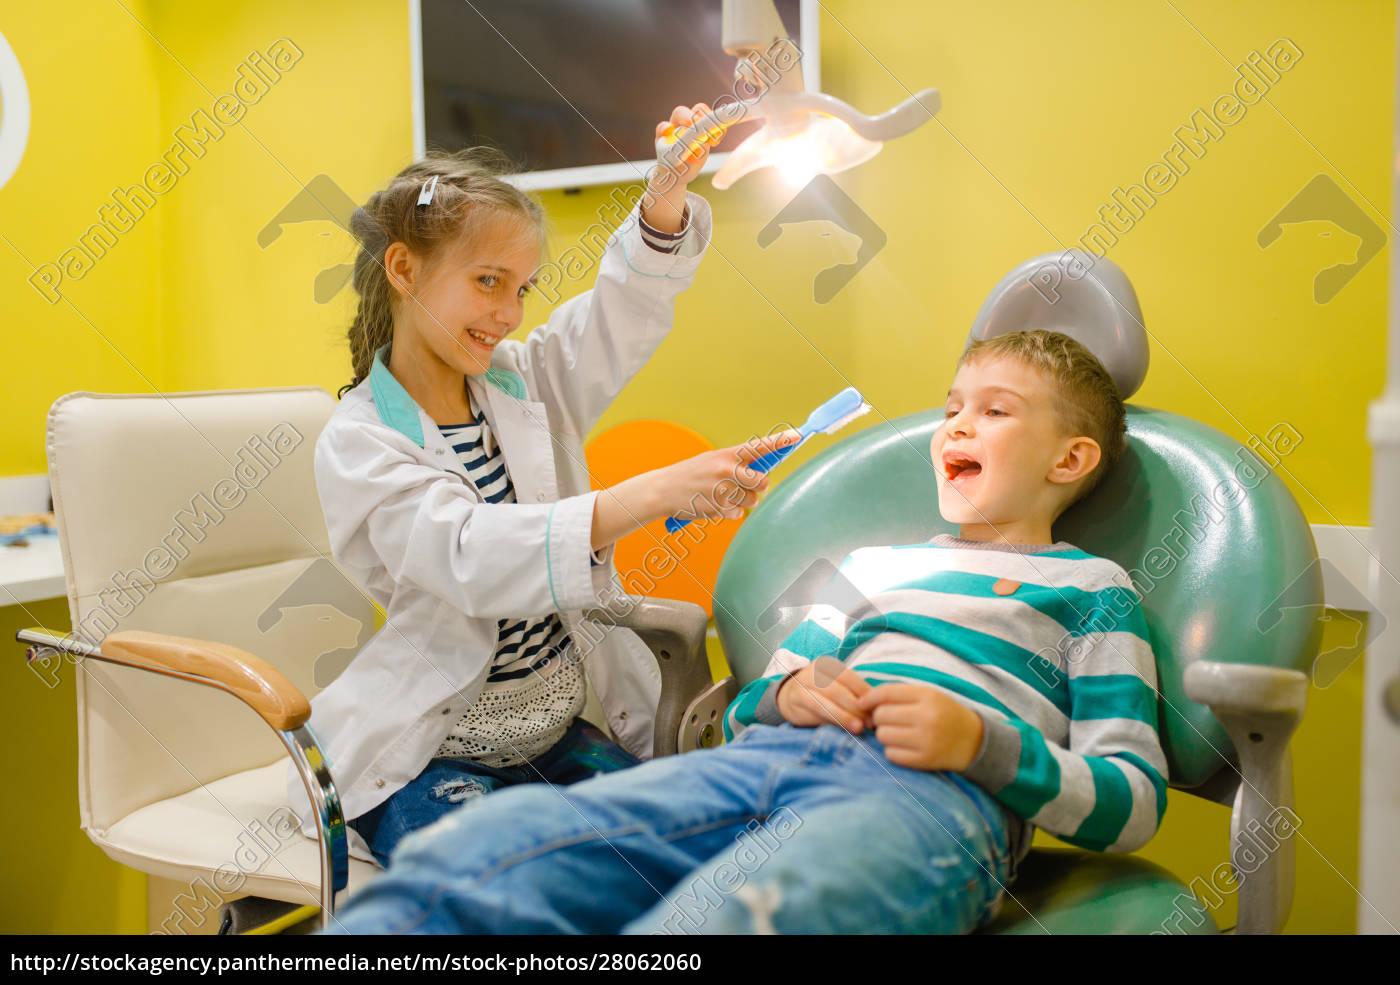 little, girl, in, uniform, playing, dentist, - 28062060